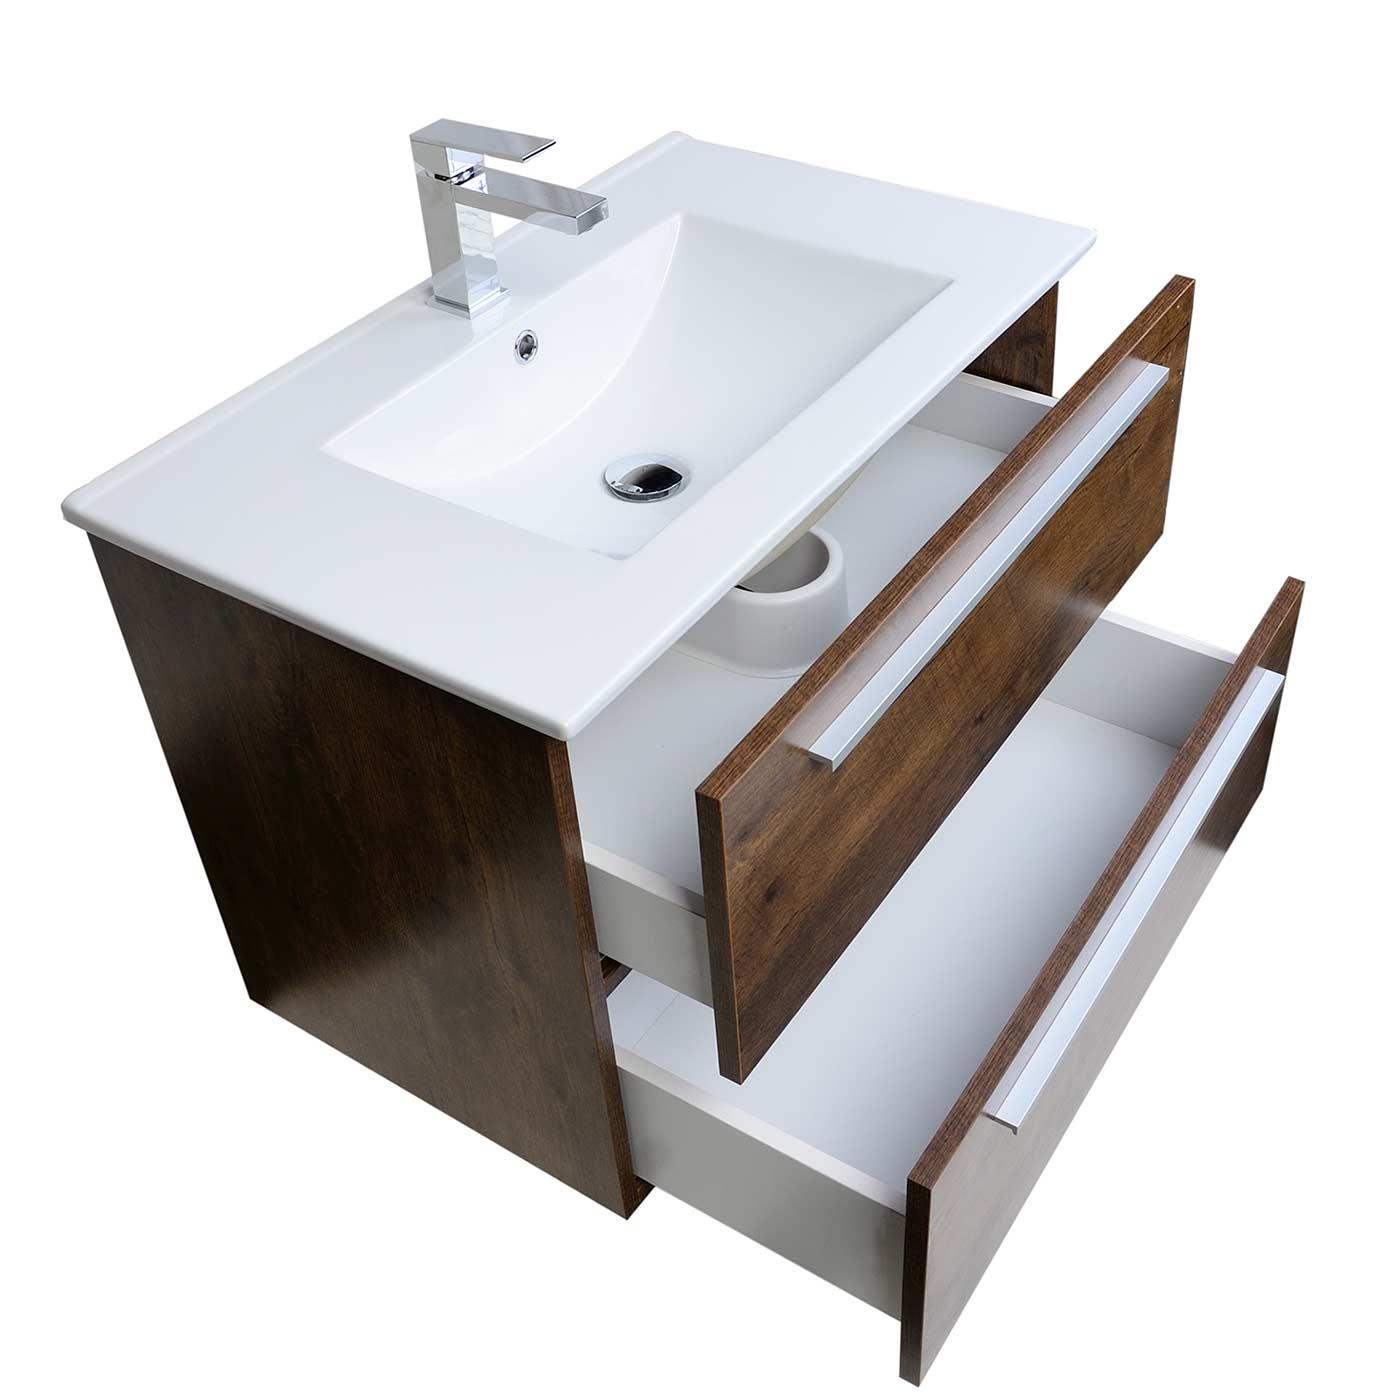 wall mounted bathroom vanity. Modern Wall Mount Bathroom Vanity Cbi Walnut RS-DM800-WN Mounted